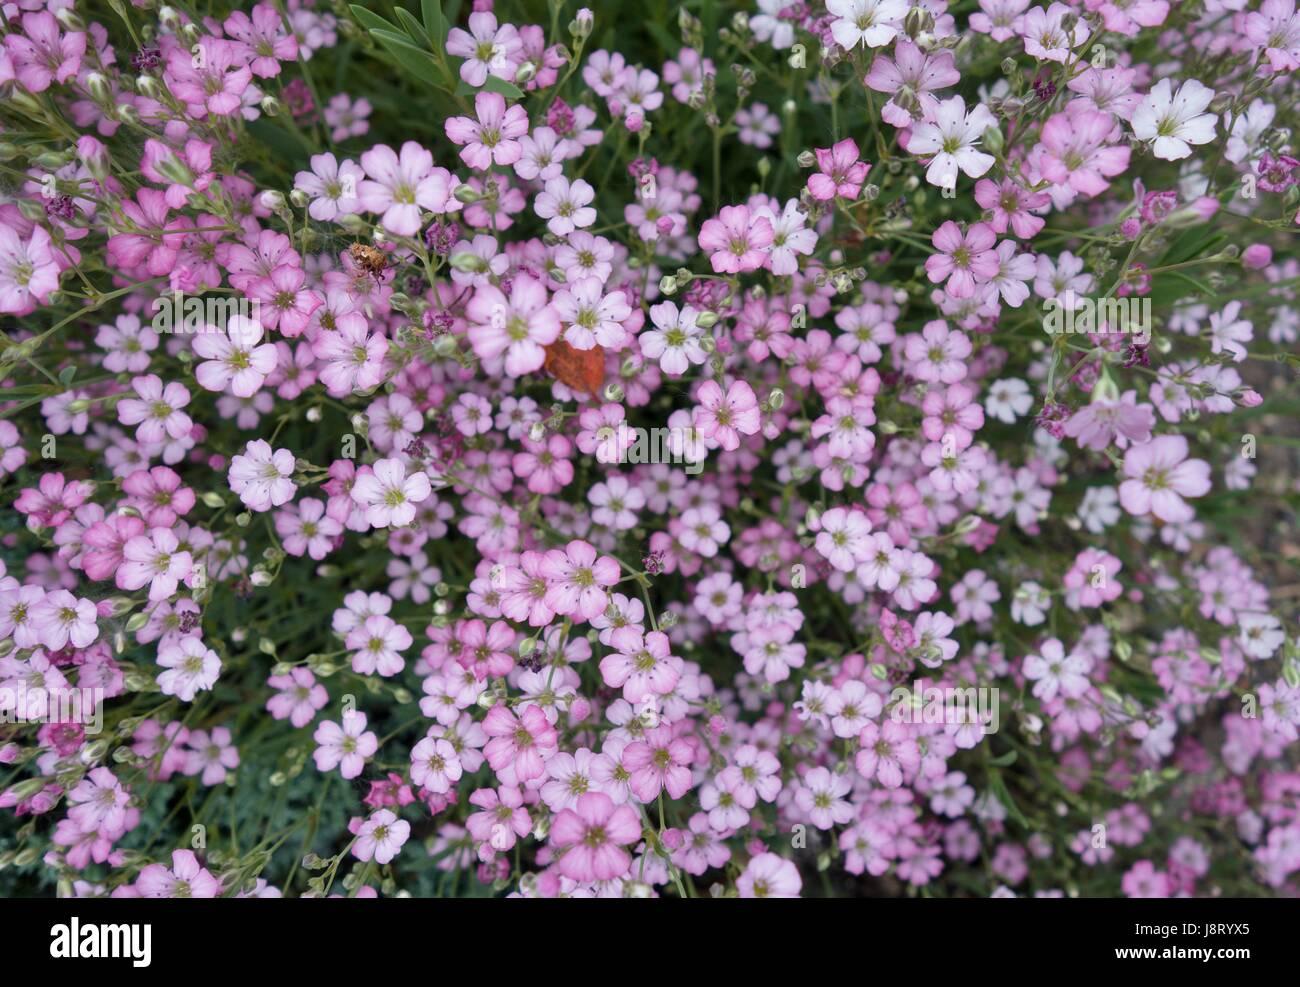 Ground cover flowers stock photos ground cover flowers stock small purple ground cover flowers stock image mightylinksfo